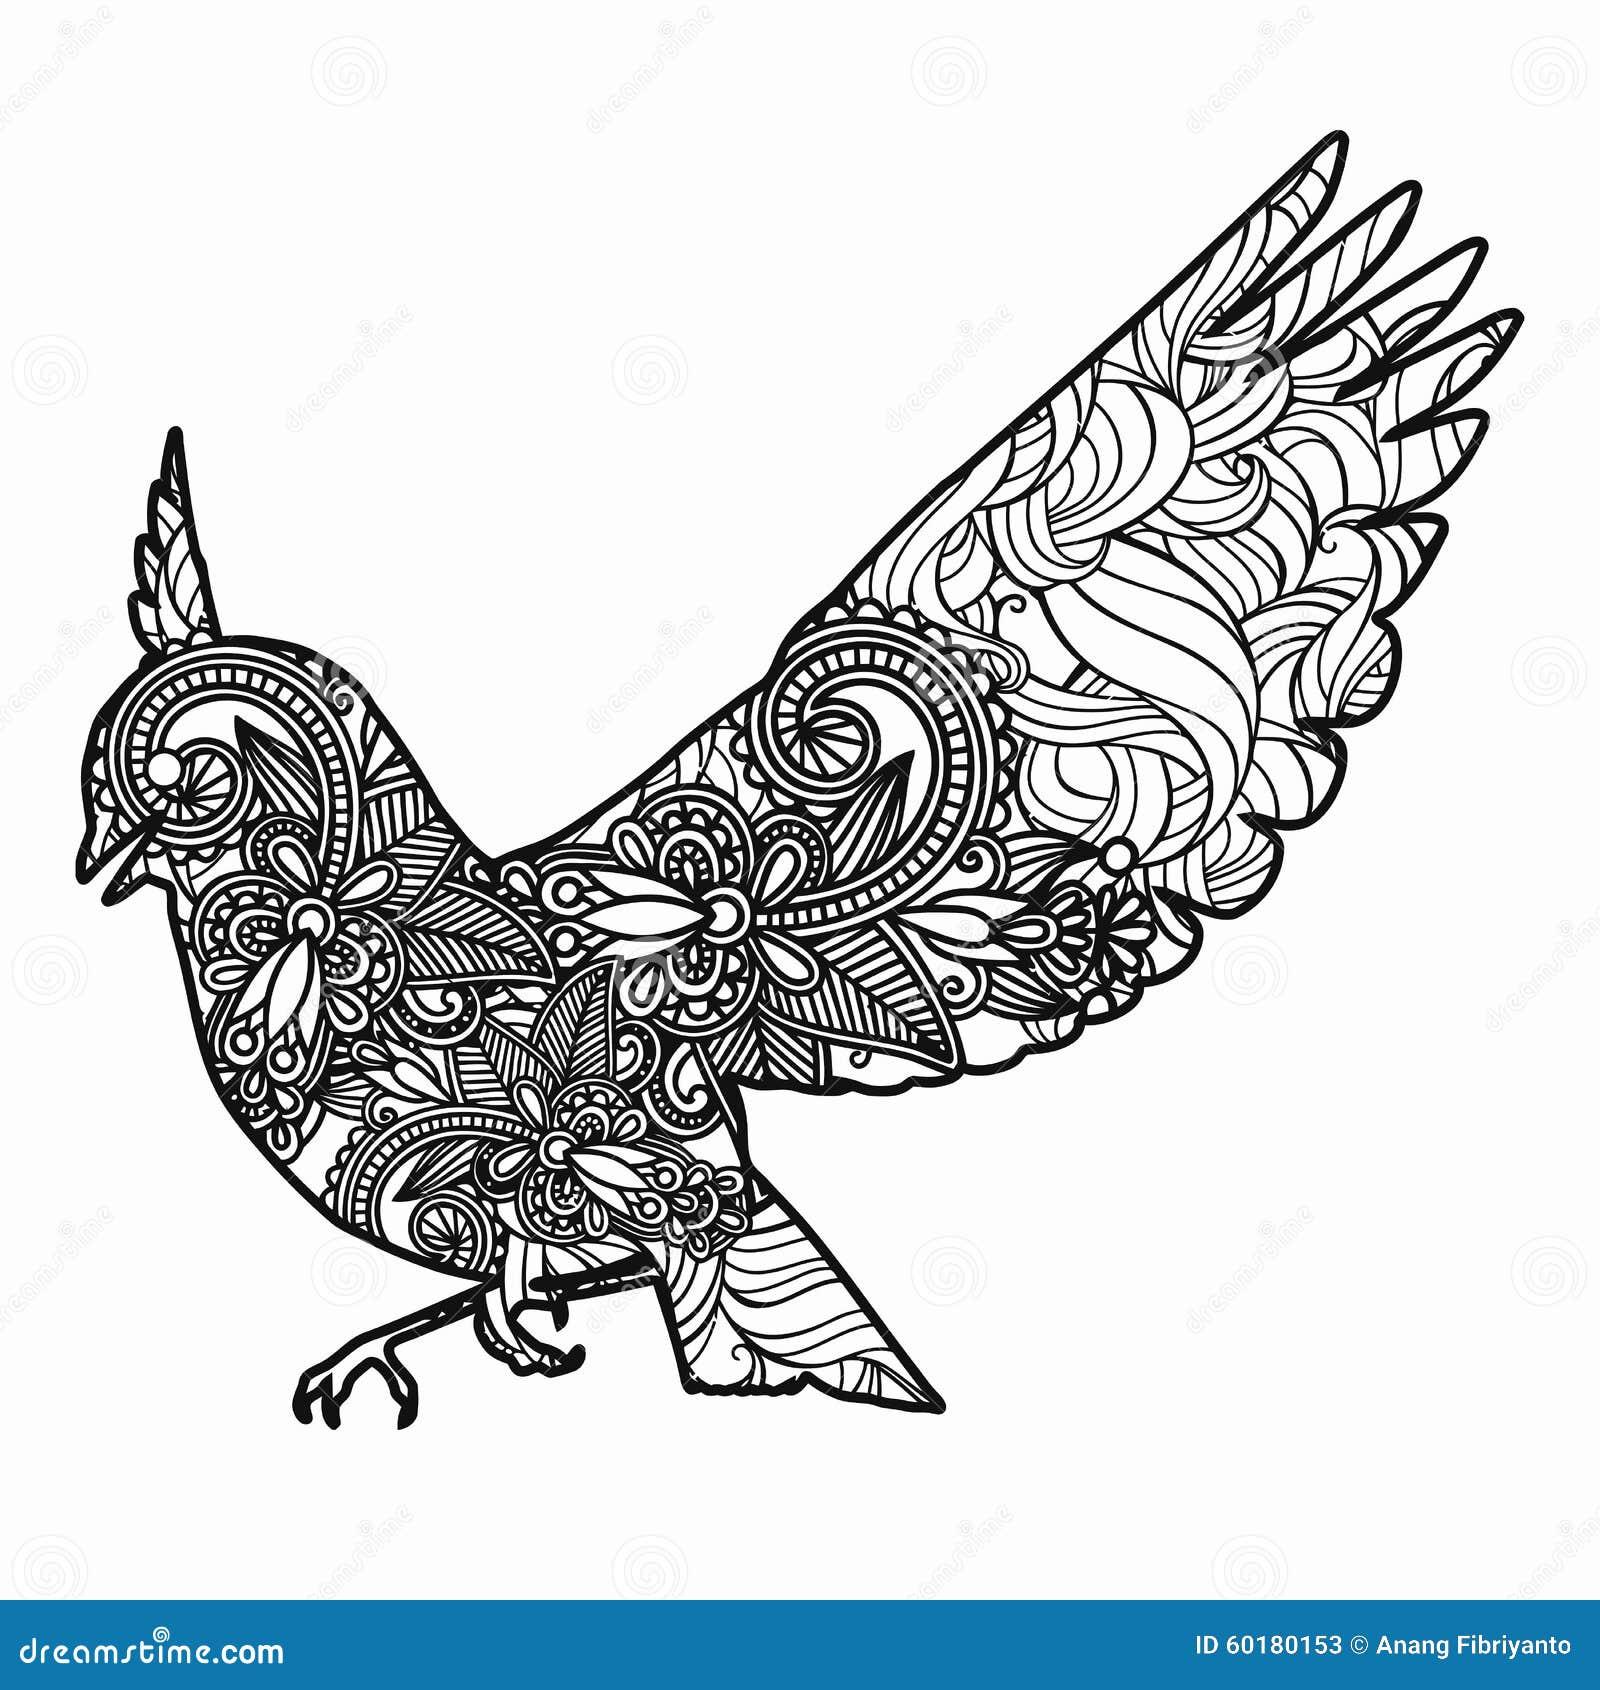 Zentangle Stylized Bird Illustration